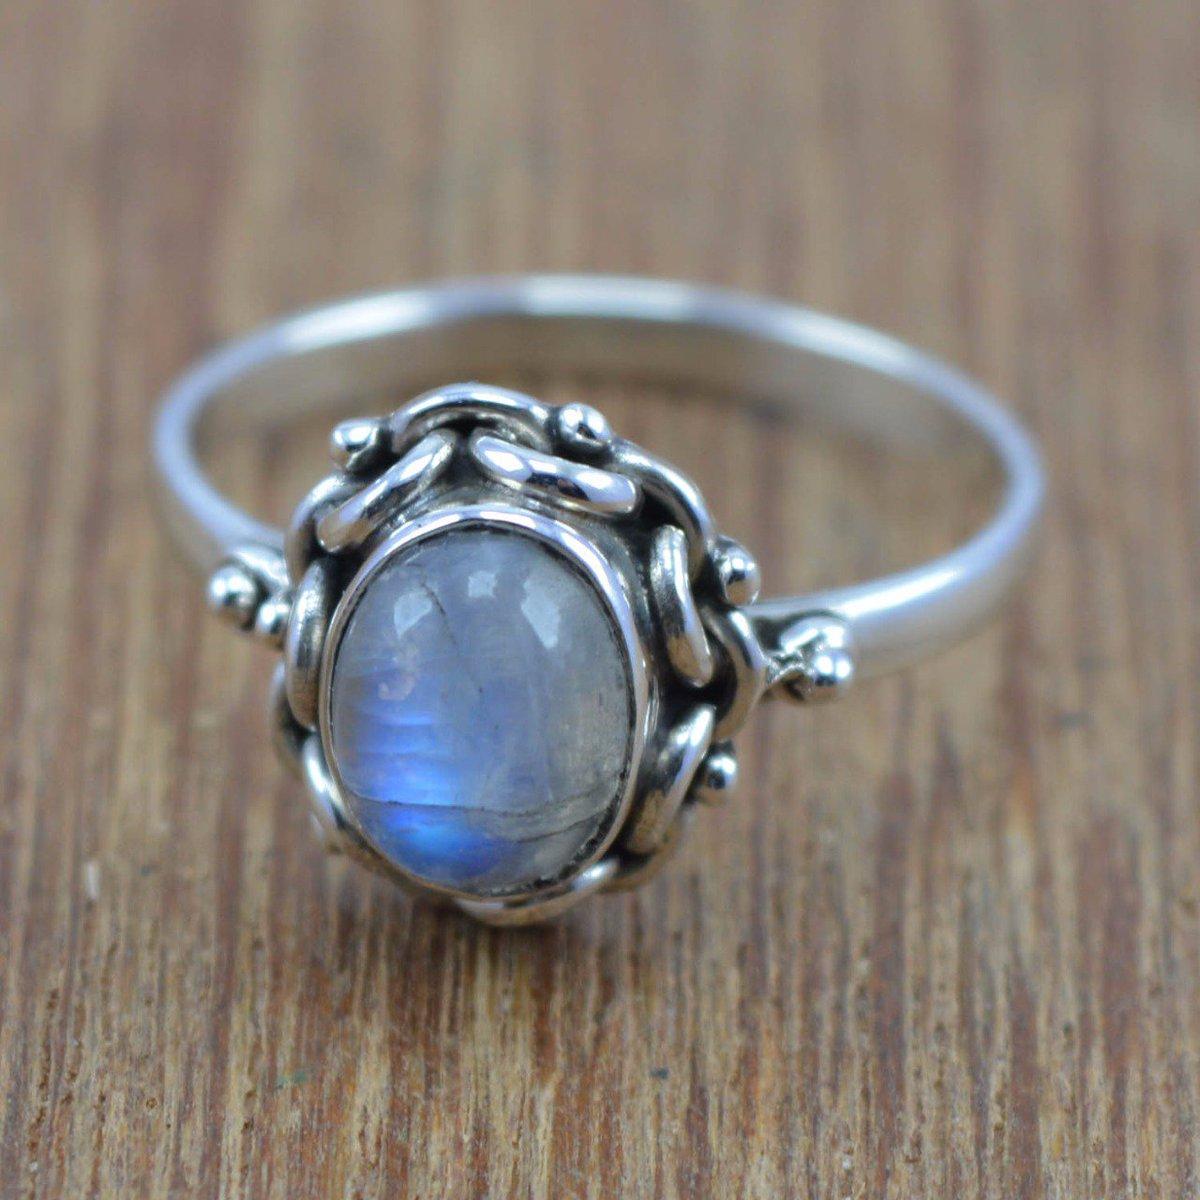 f8fb6d521 Code- WR-4307 #handmadesilver #natural #order #wholesale #handmade  #silver925 #sterling #silverjewelrydoctor #silvergemstonejewelry  #silverring #moonstone ...